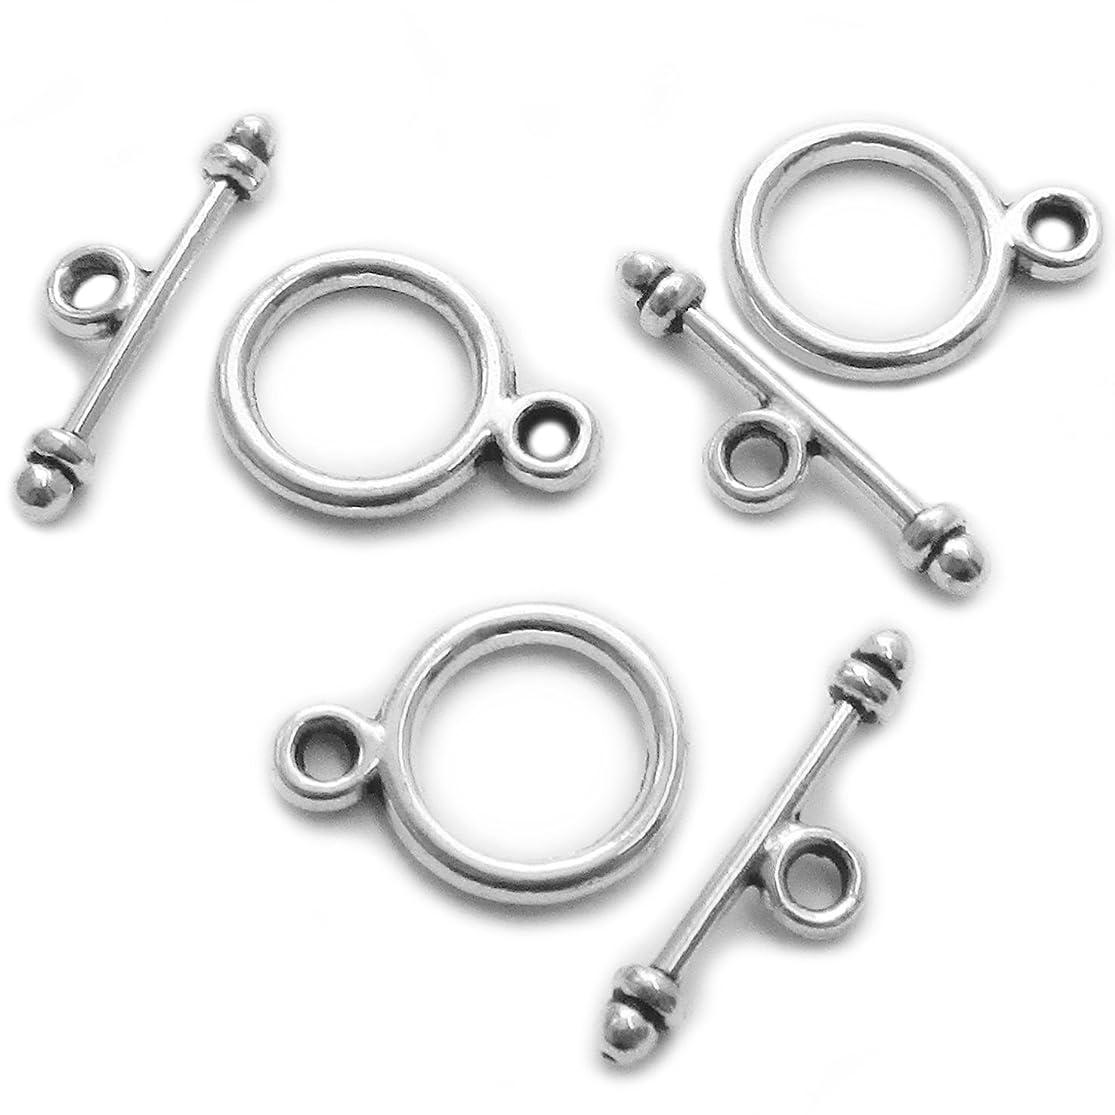 Heather's cf 130 set Toggle Jewelry Clasps Necklace Toggle Clasp Silver Toggle Clasps for Jewelry Making kvnnyqwb7